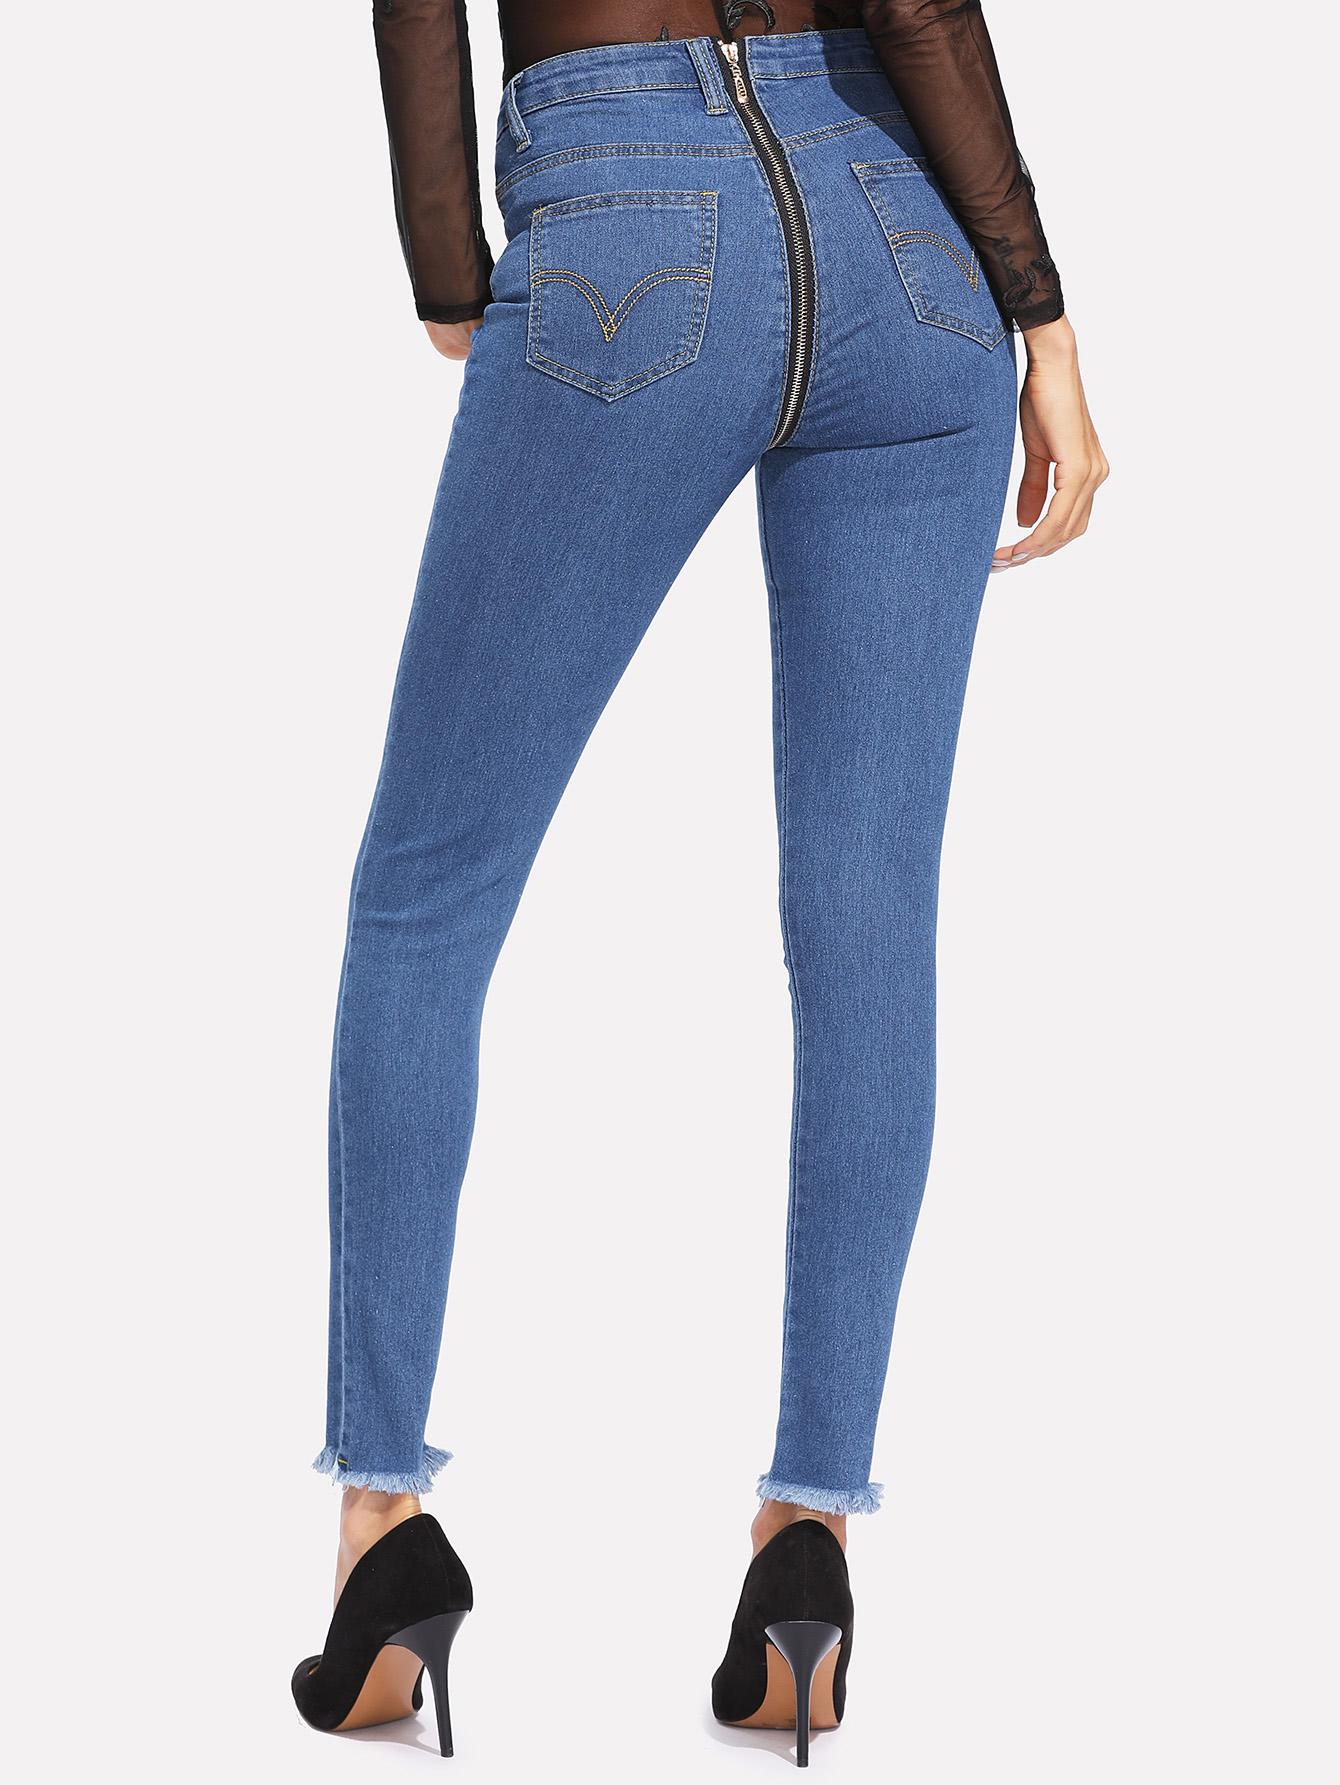 1acf3b26ad Zip Back Frayed Hem Jeans -SheIn(Sheinside)